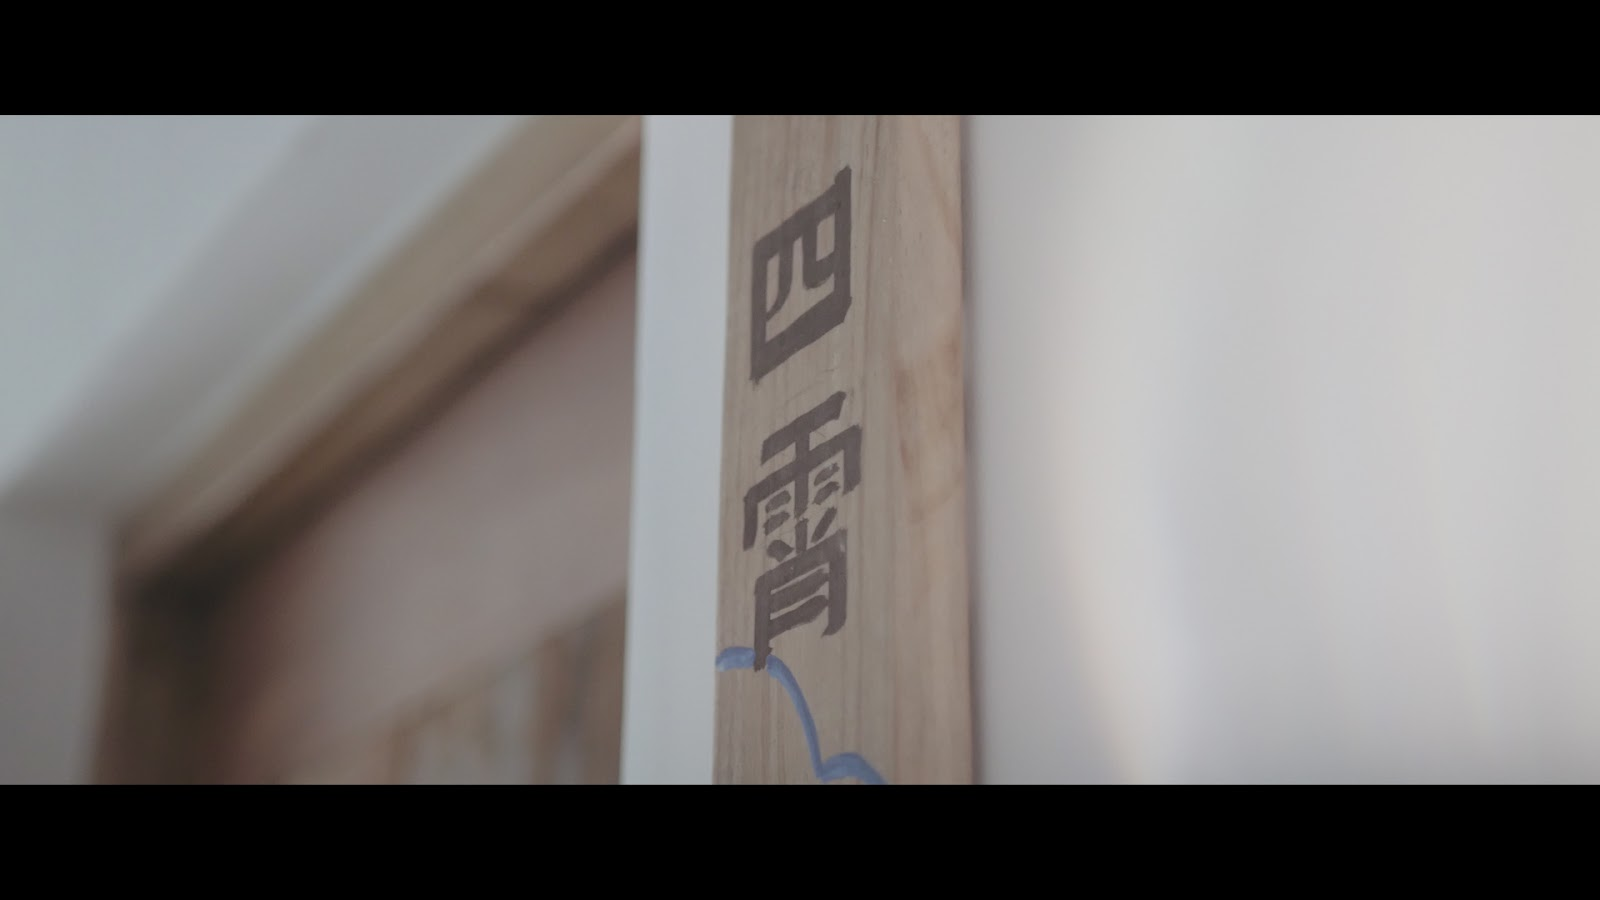 drone dji china  | 960 x 540